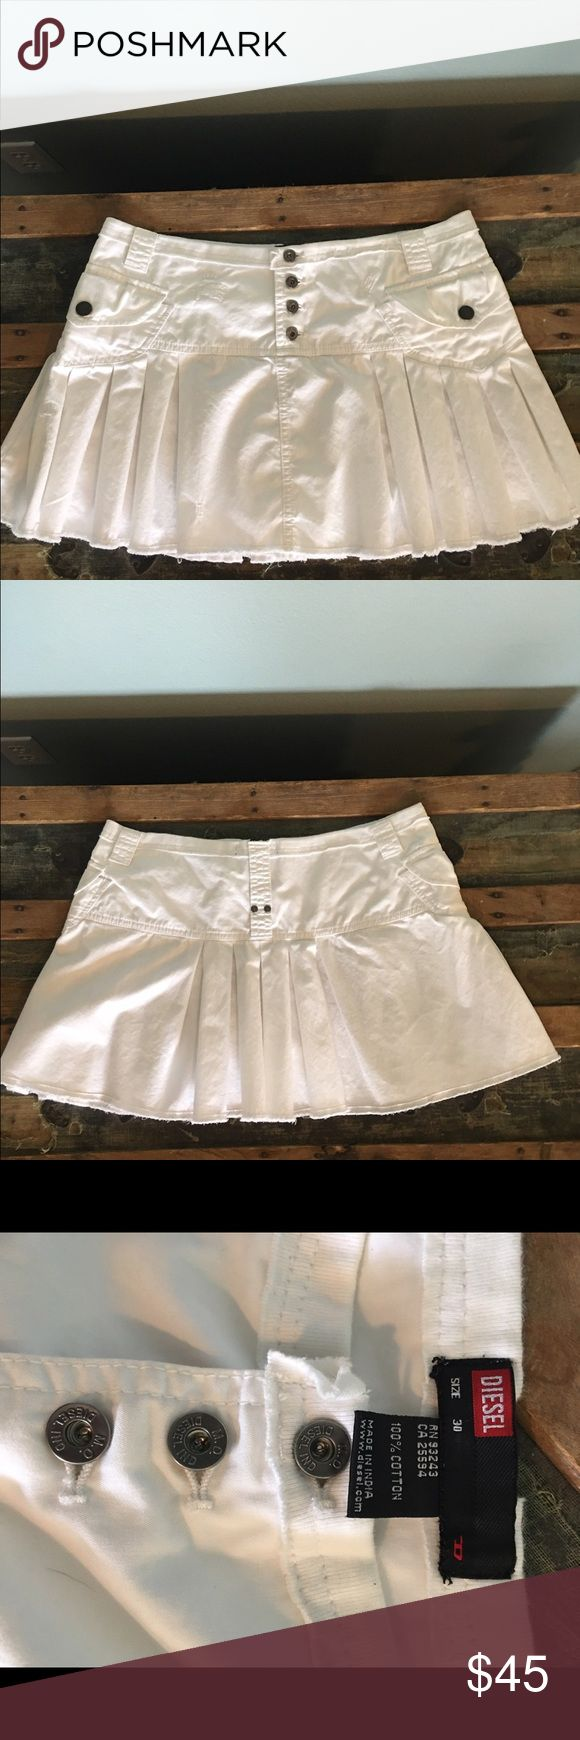 "Diesel skirt Super cute, white distressed, frayed hem, mini skirt, size 30, waist to hem 12"". Looks like new! Diesel Skirts Mini"